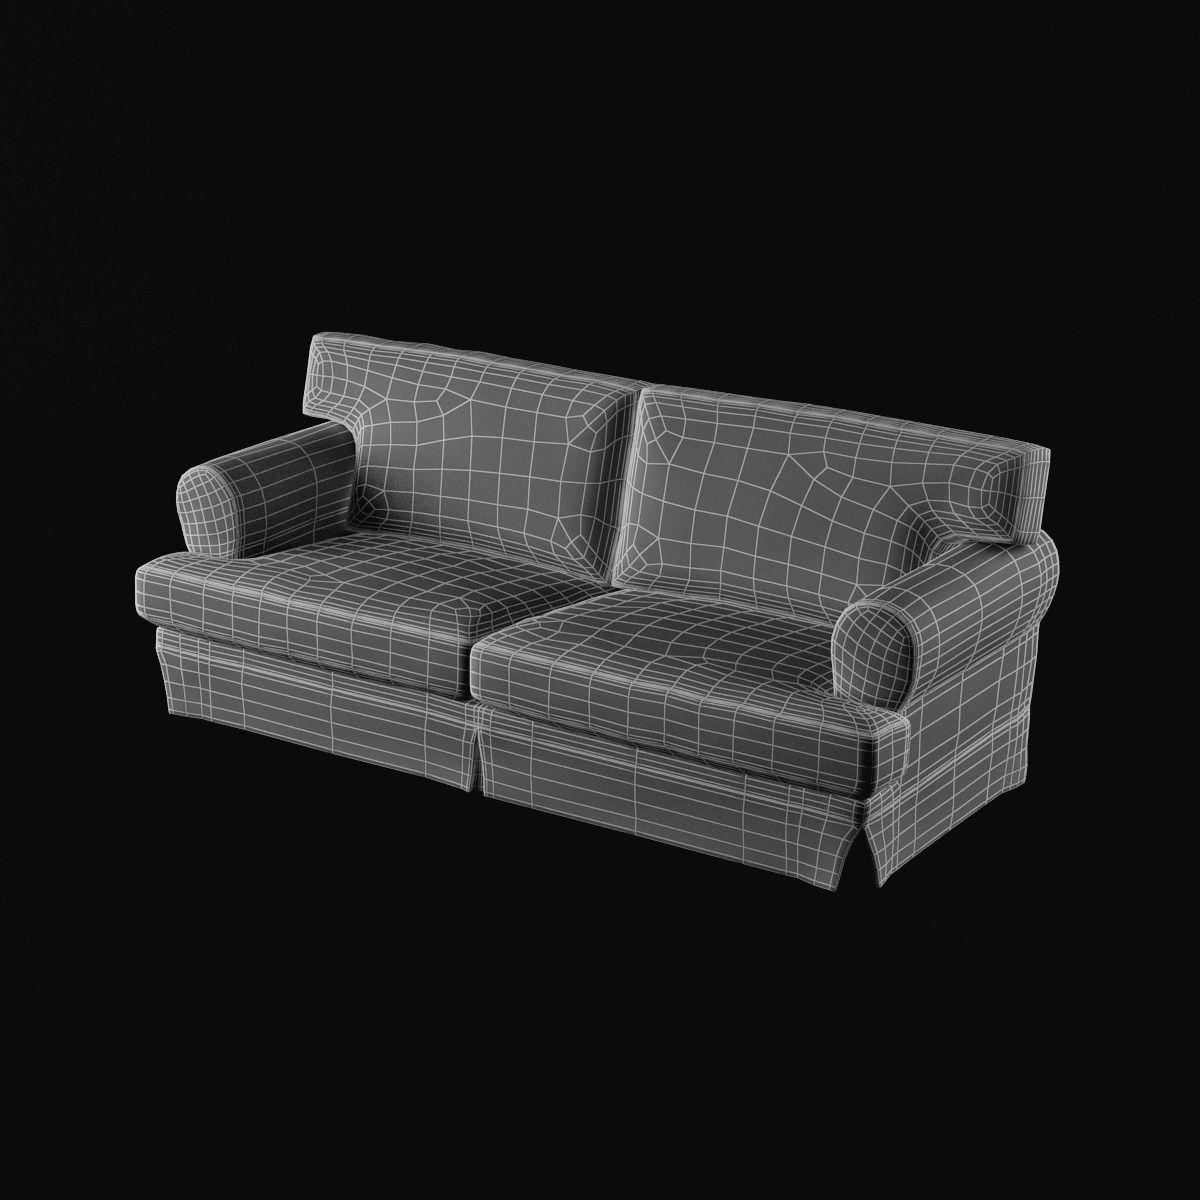 ikea ekeskog sofa for sale sefton manual 3 seater recliner black 3d model max cgtrader